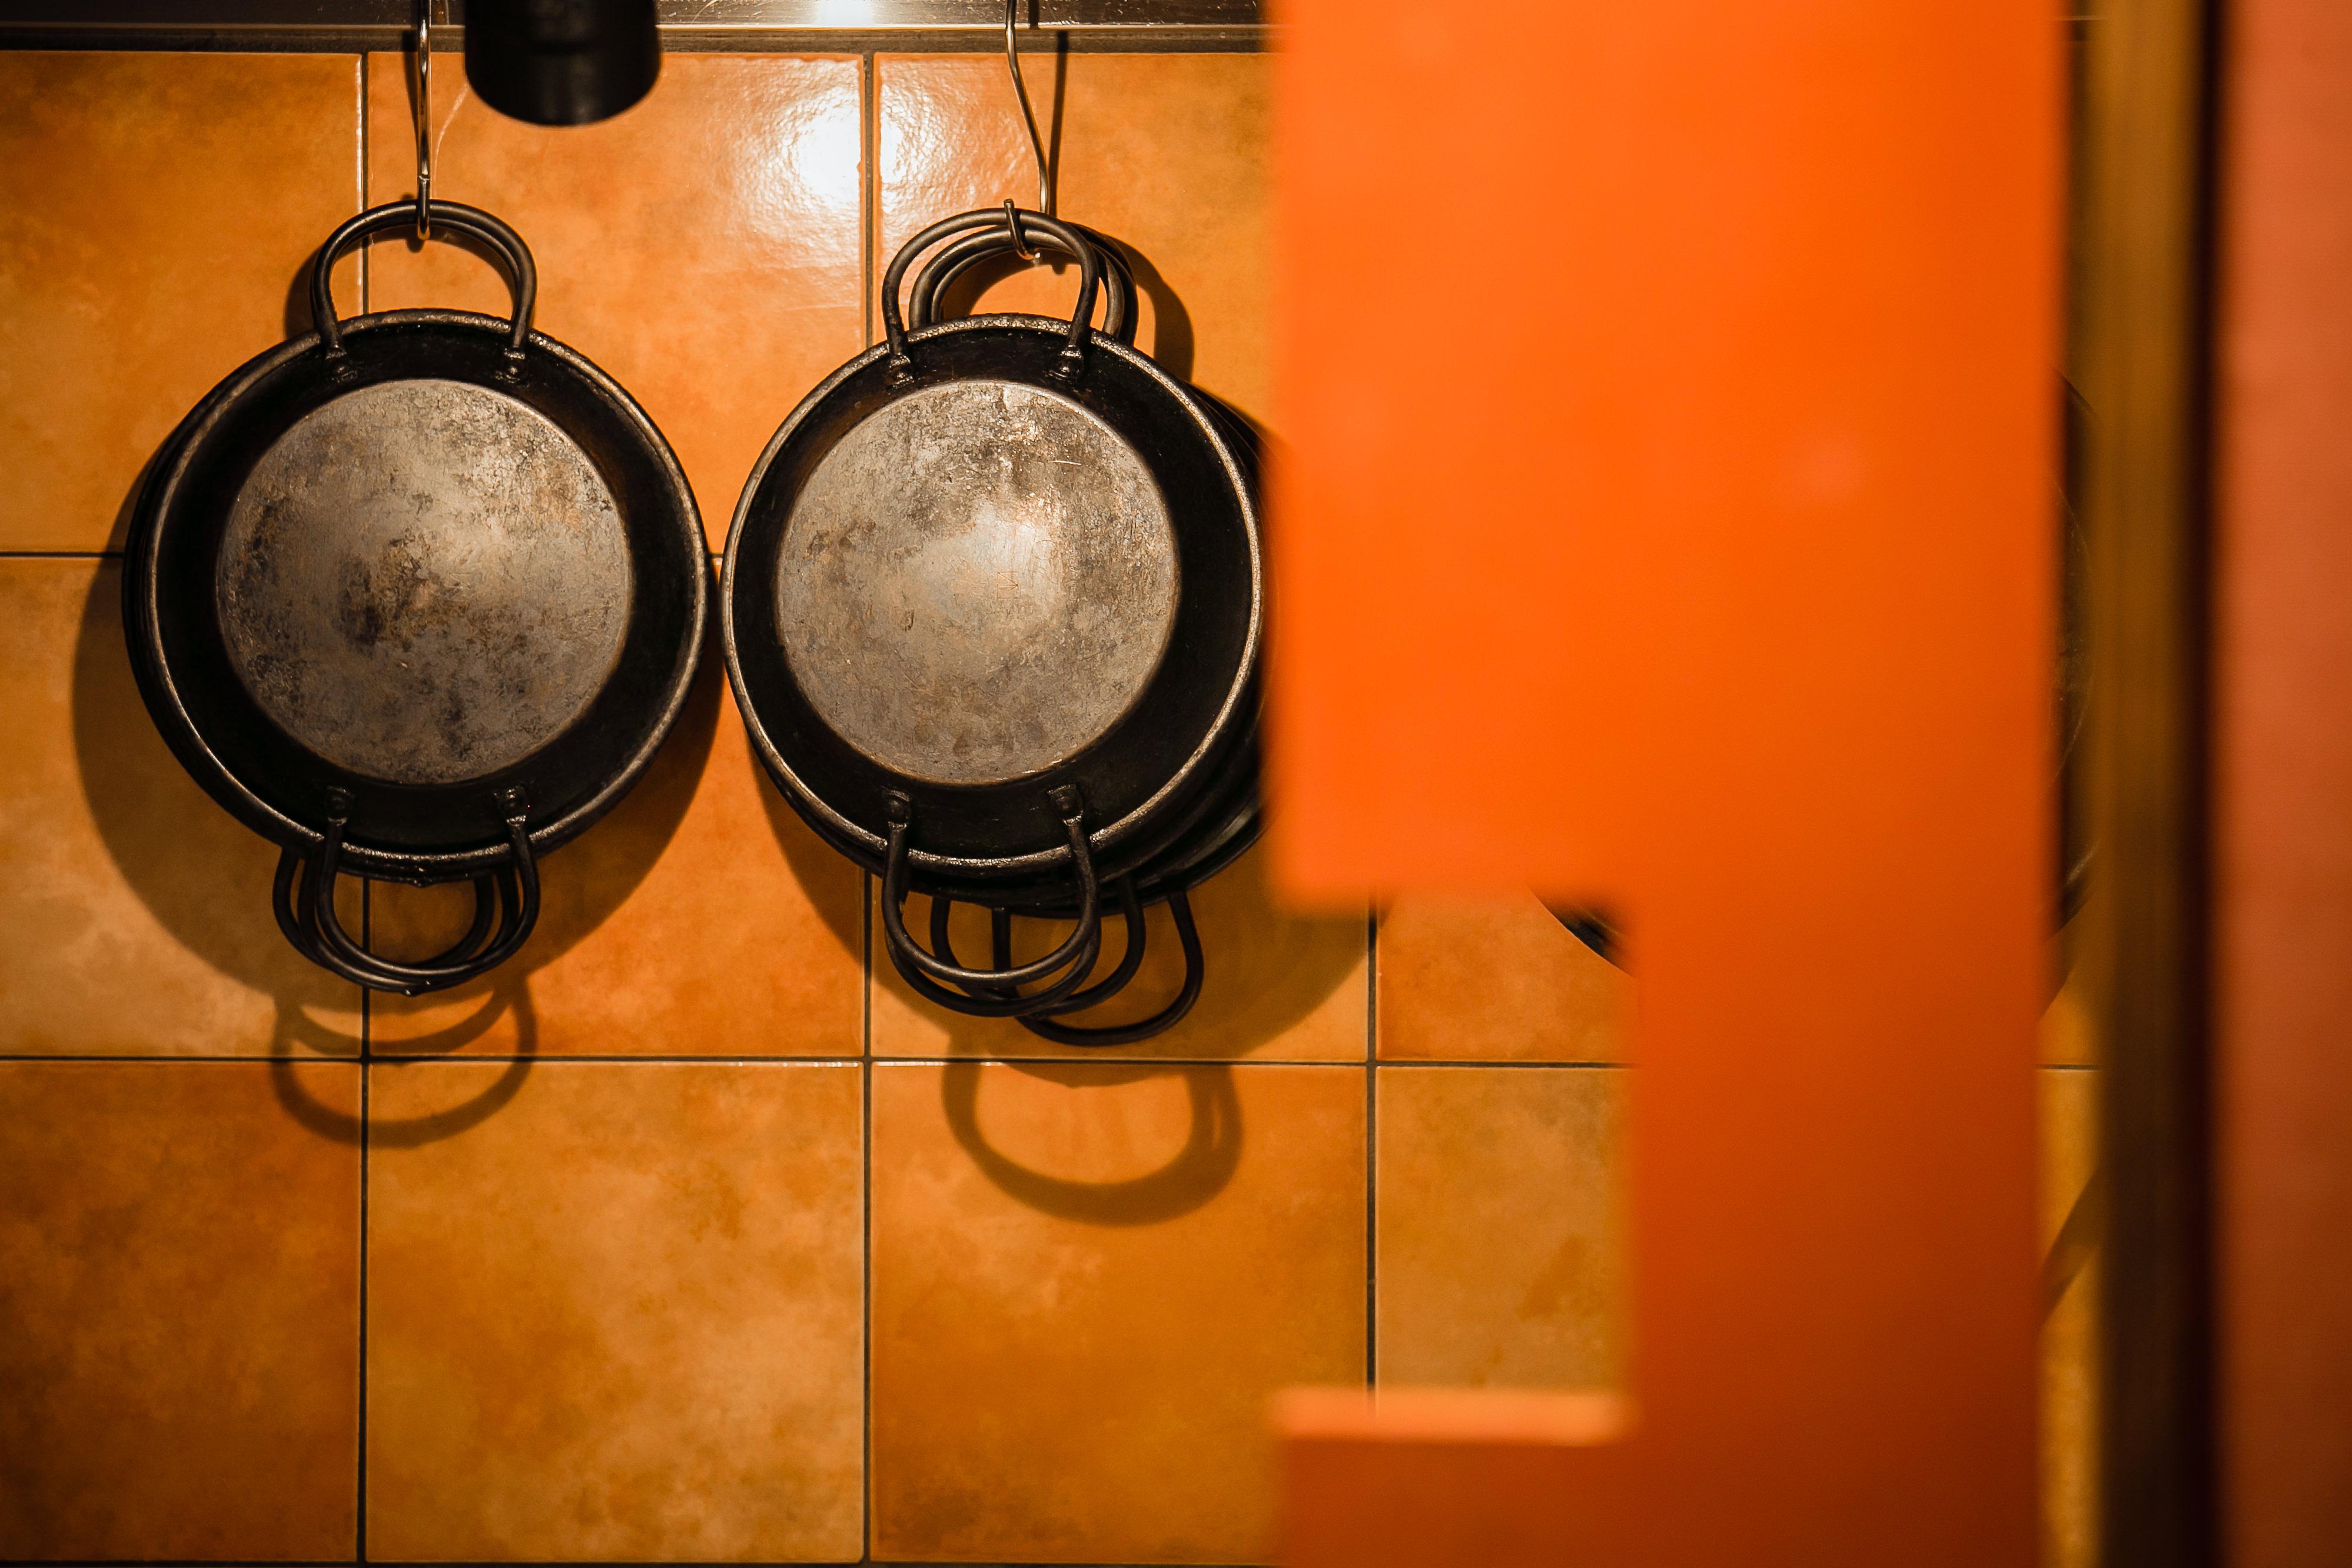 Spanish Cuisine aca 1° kitchen